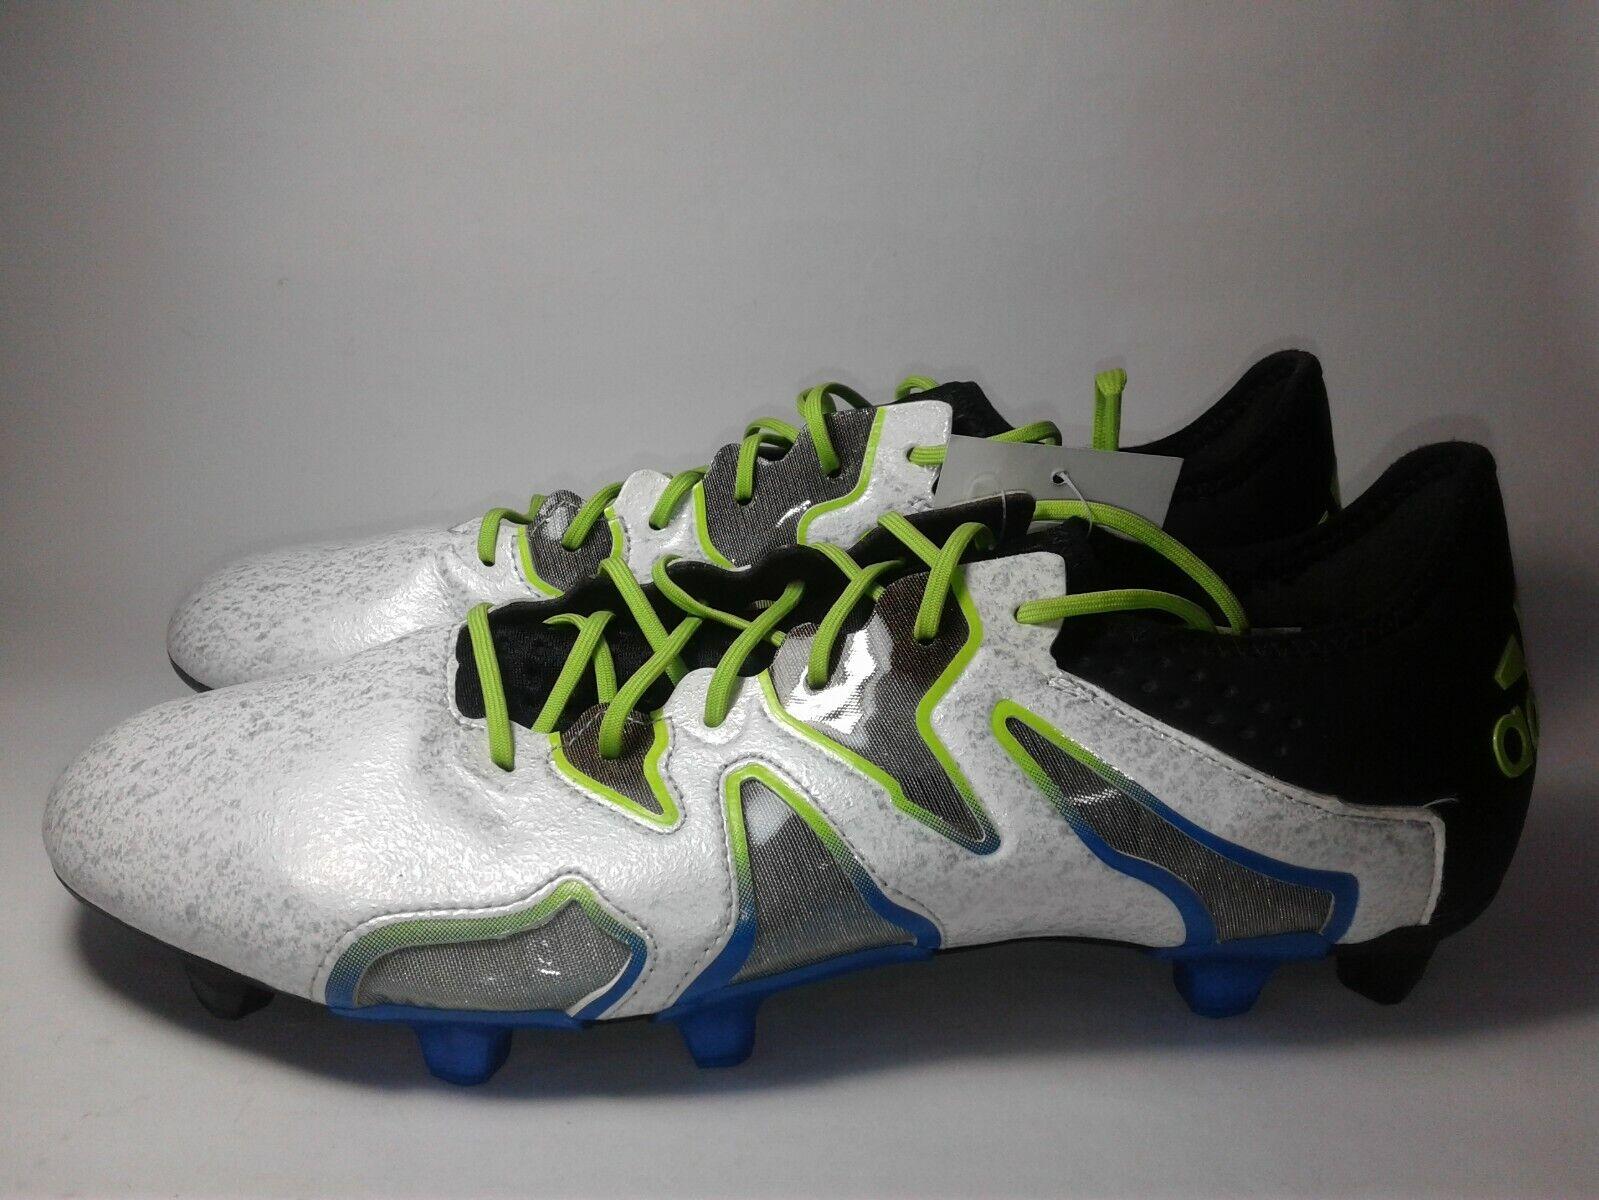 Adidas X15+ SL US9 UK8.5 AF4693 (ProjoATOR F50 NEMEZIZ)